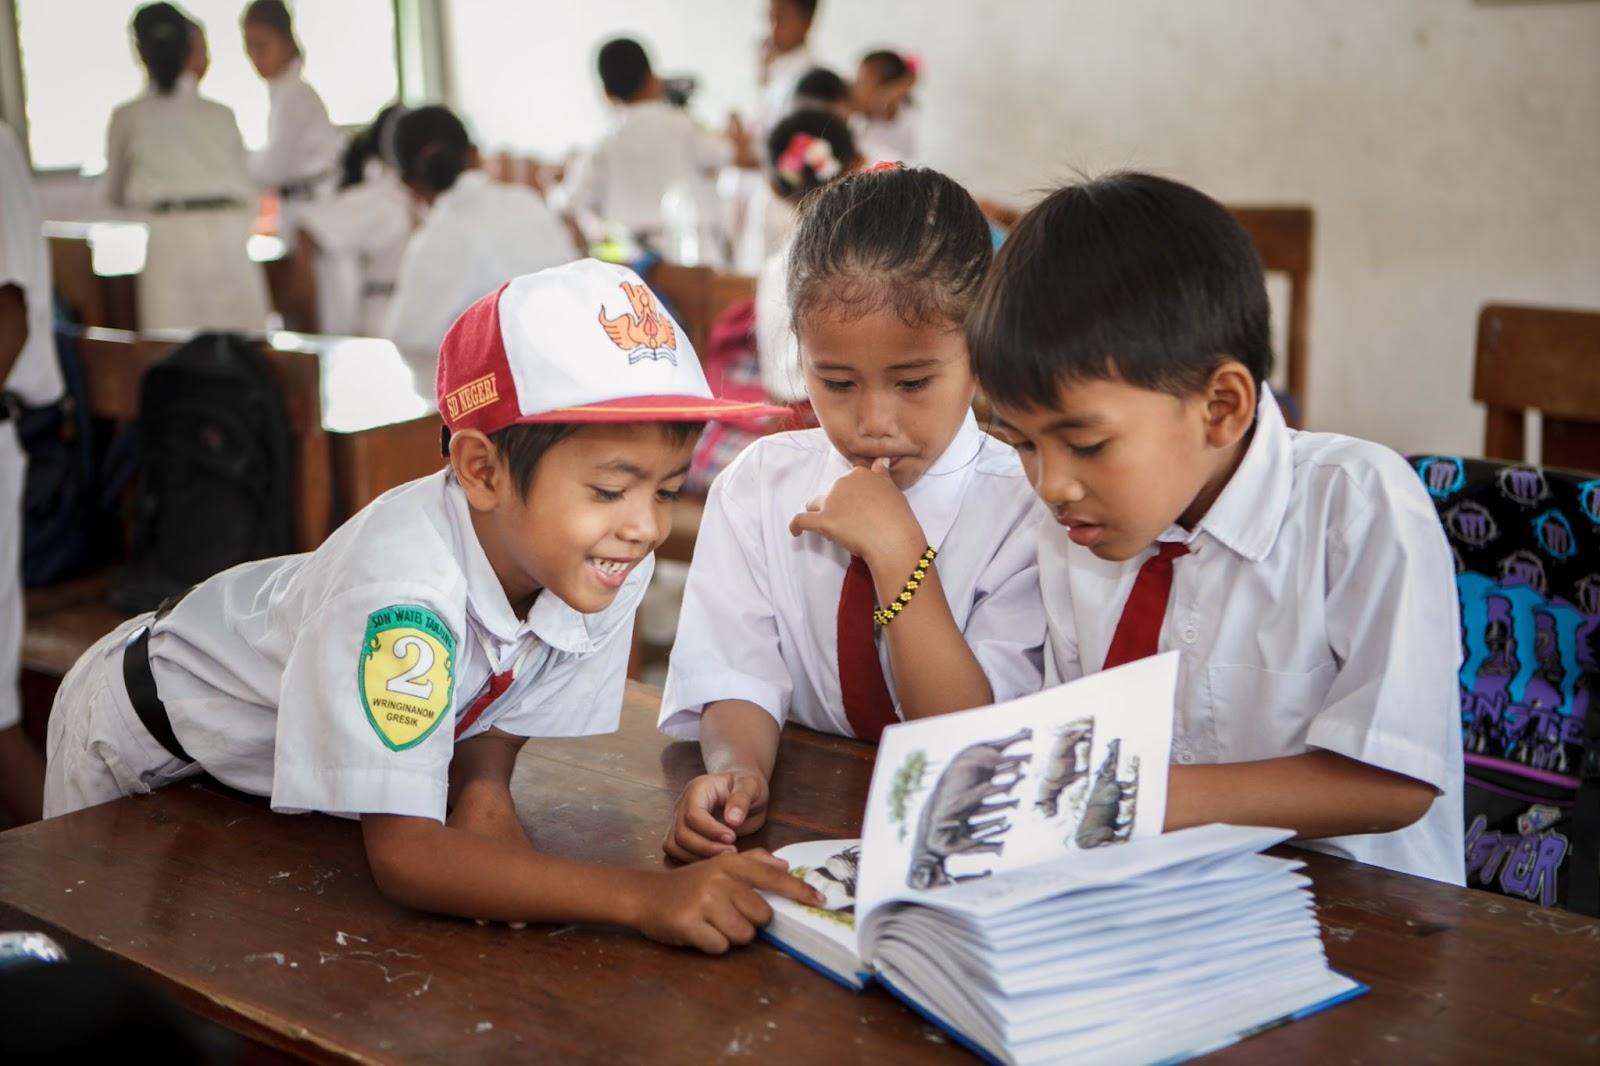 kurikulum-pendidikan-di-indonesia-sikap-dan-perilaku-murid